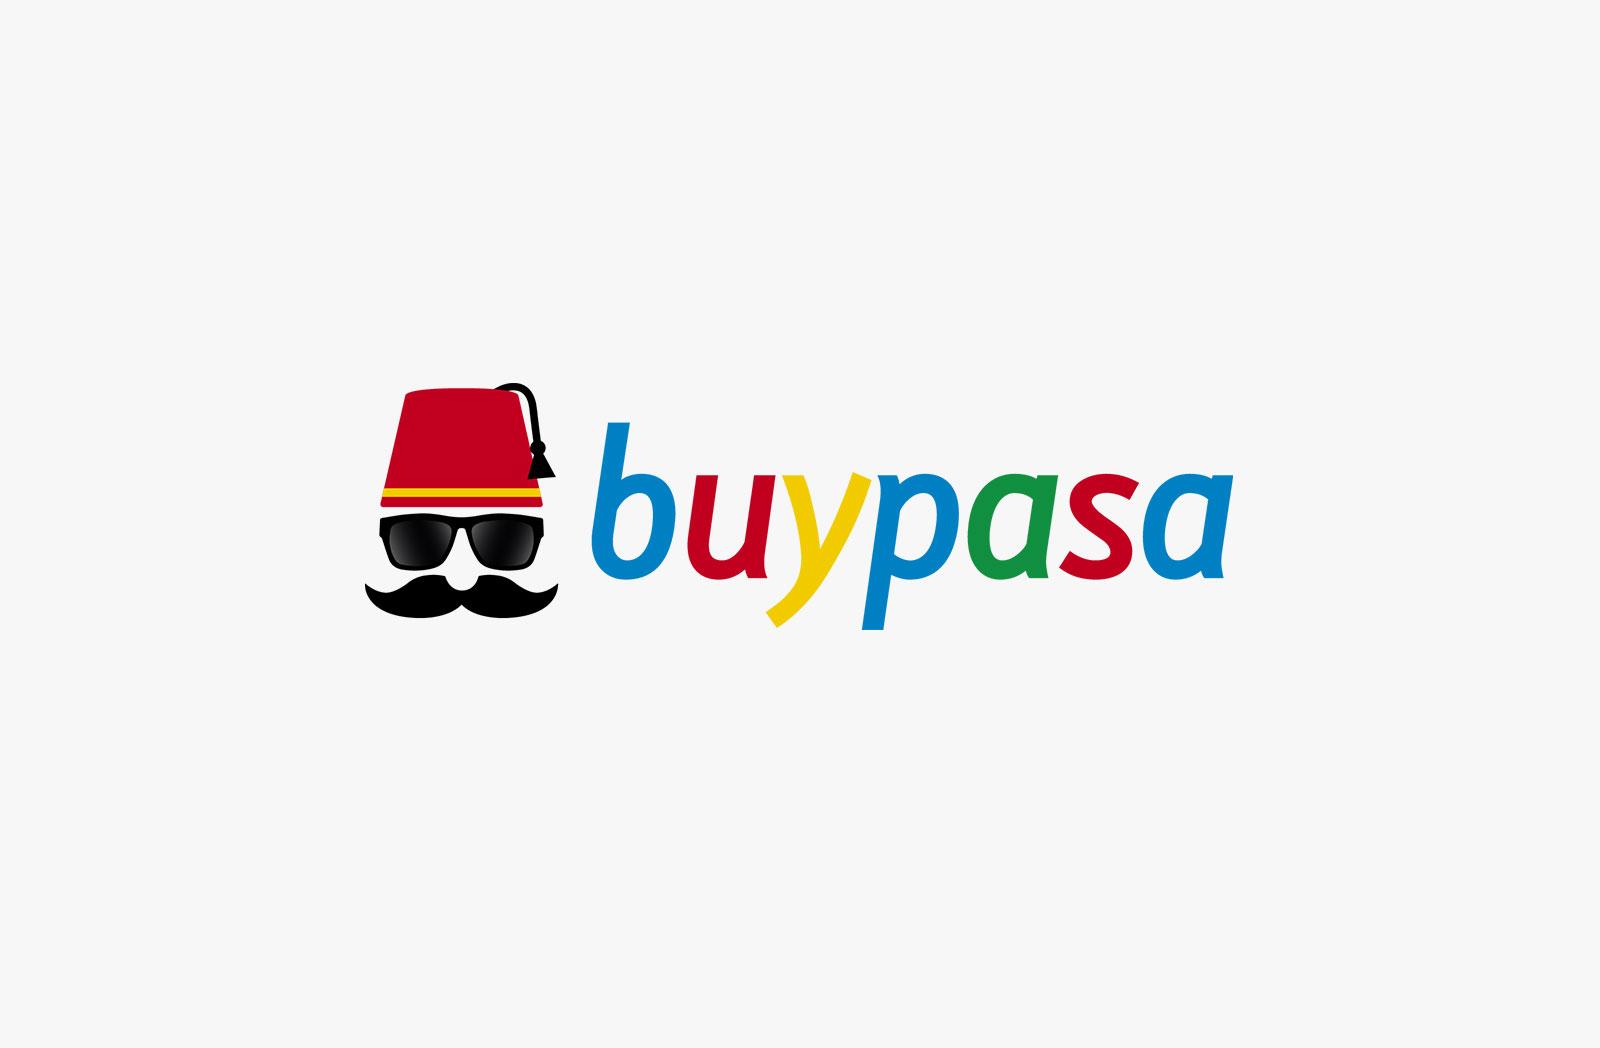 buypasa-indirim